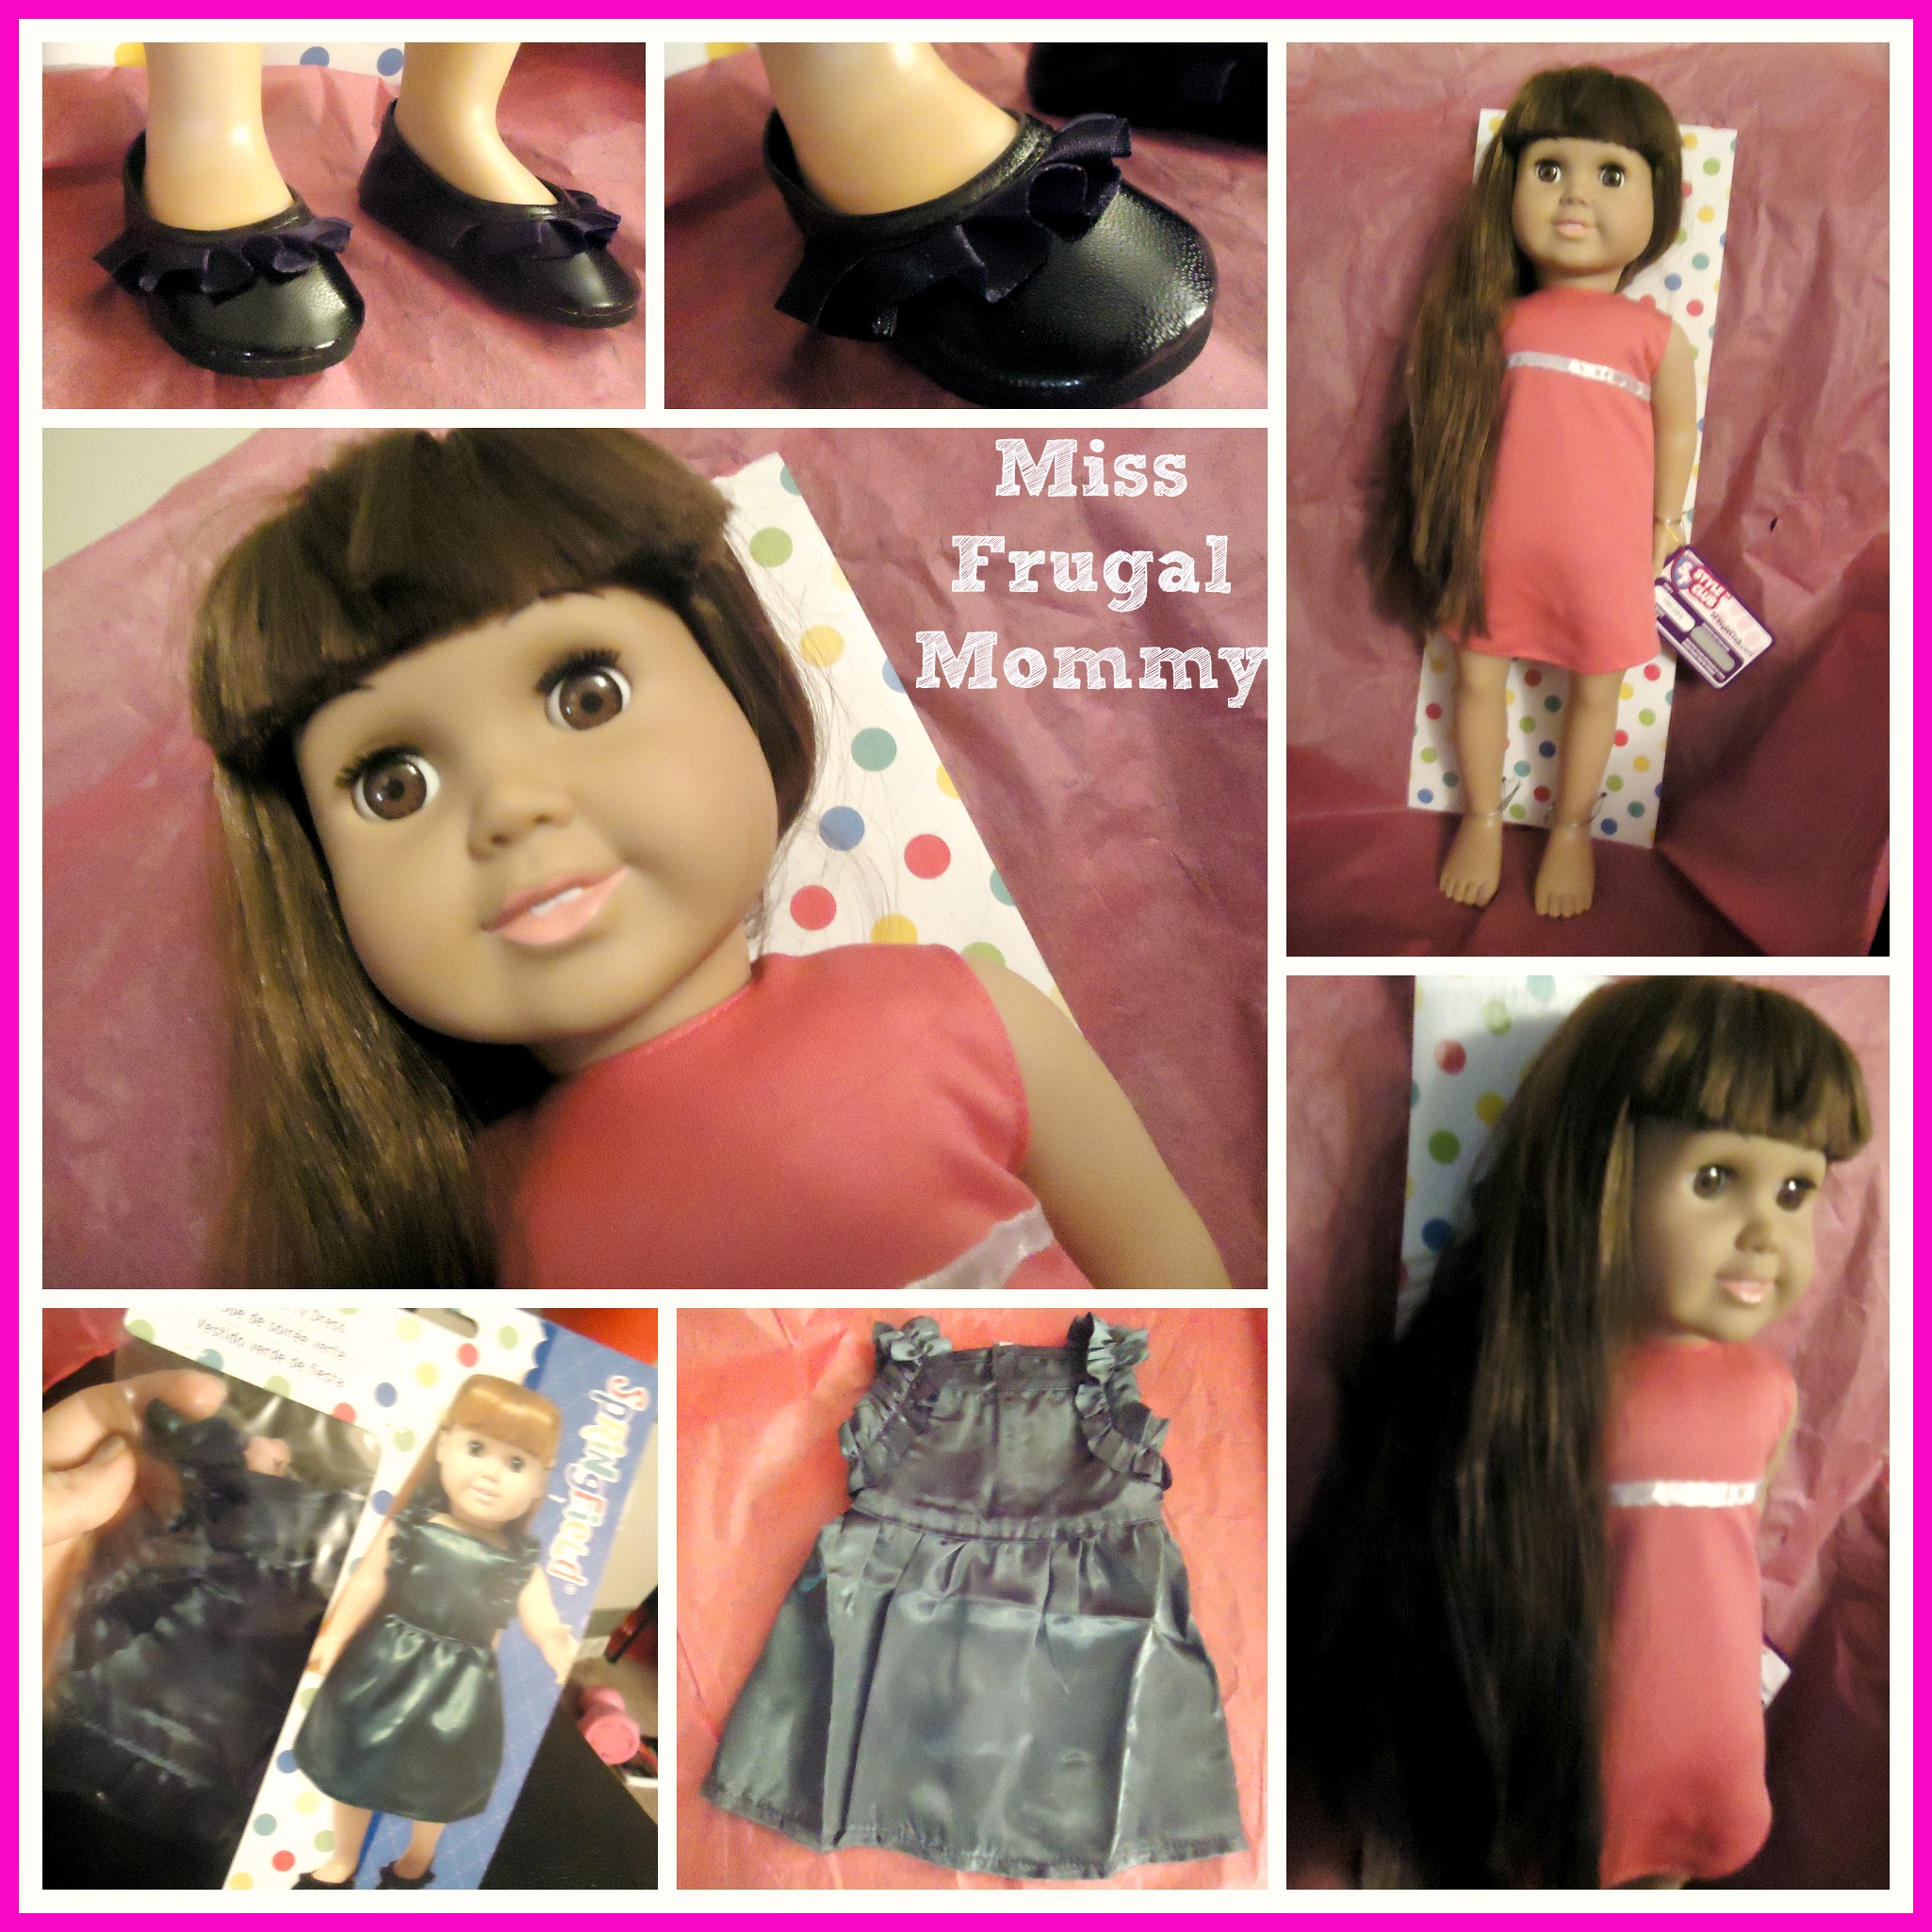 http://missfrugalmommy.com/wp-content/uploads/2013/12/doll.jpg